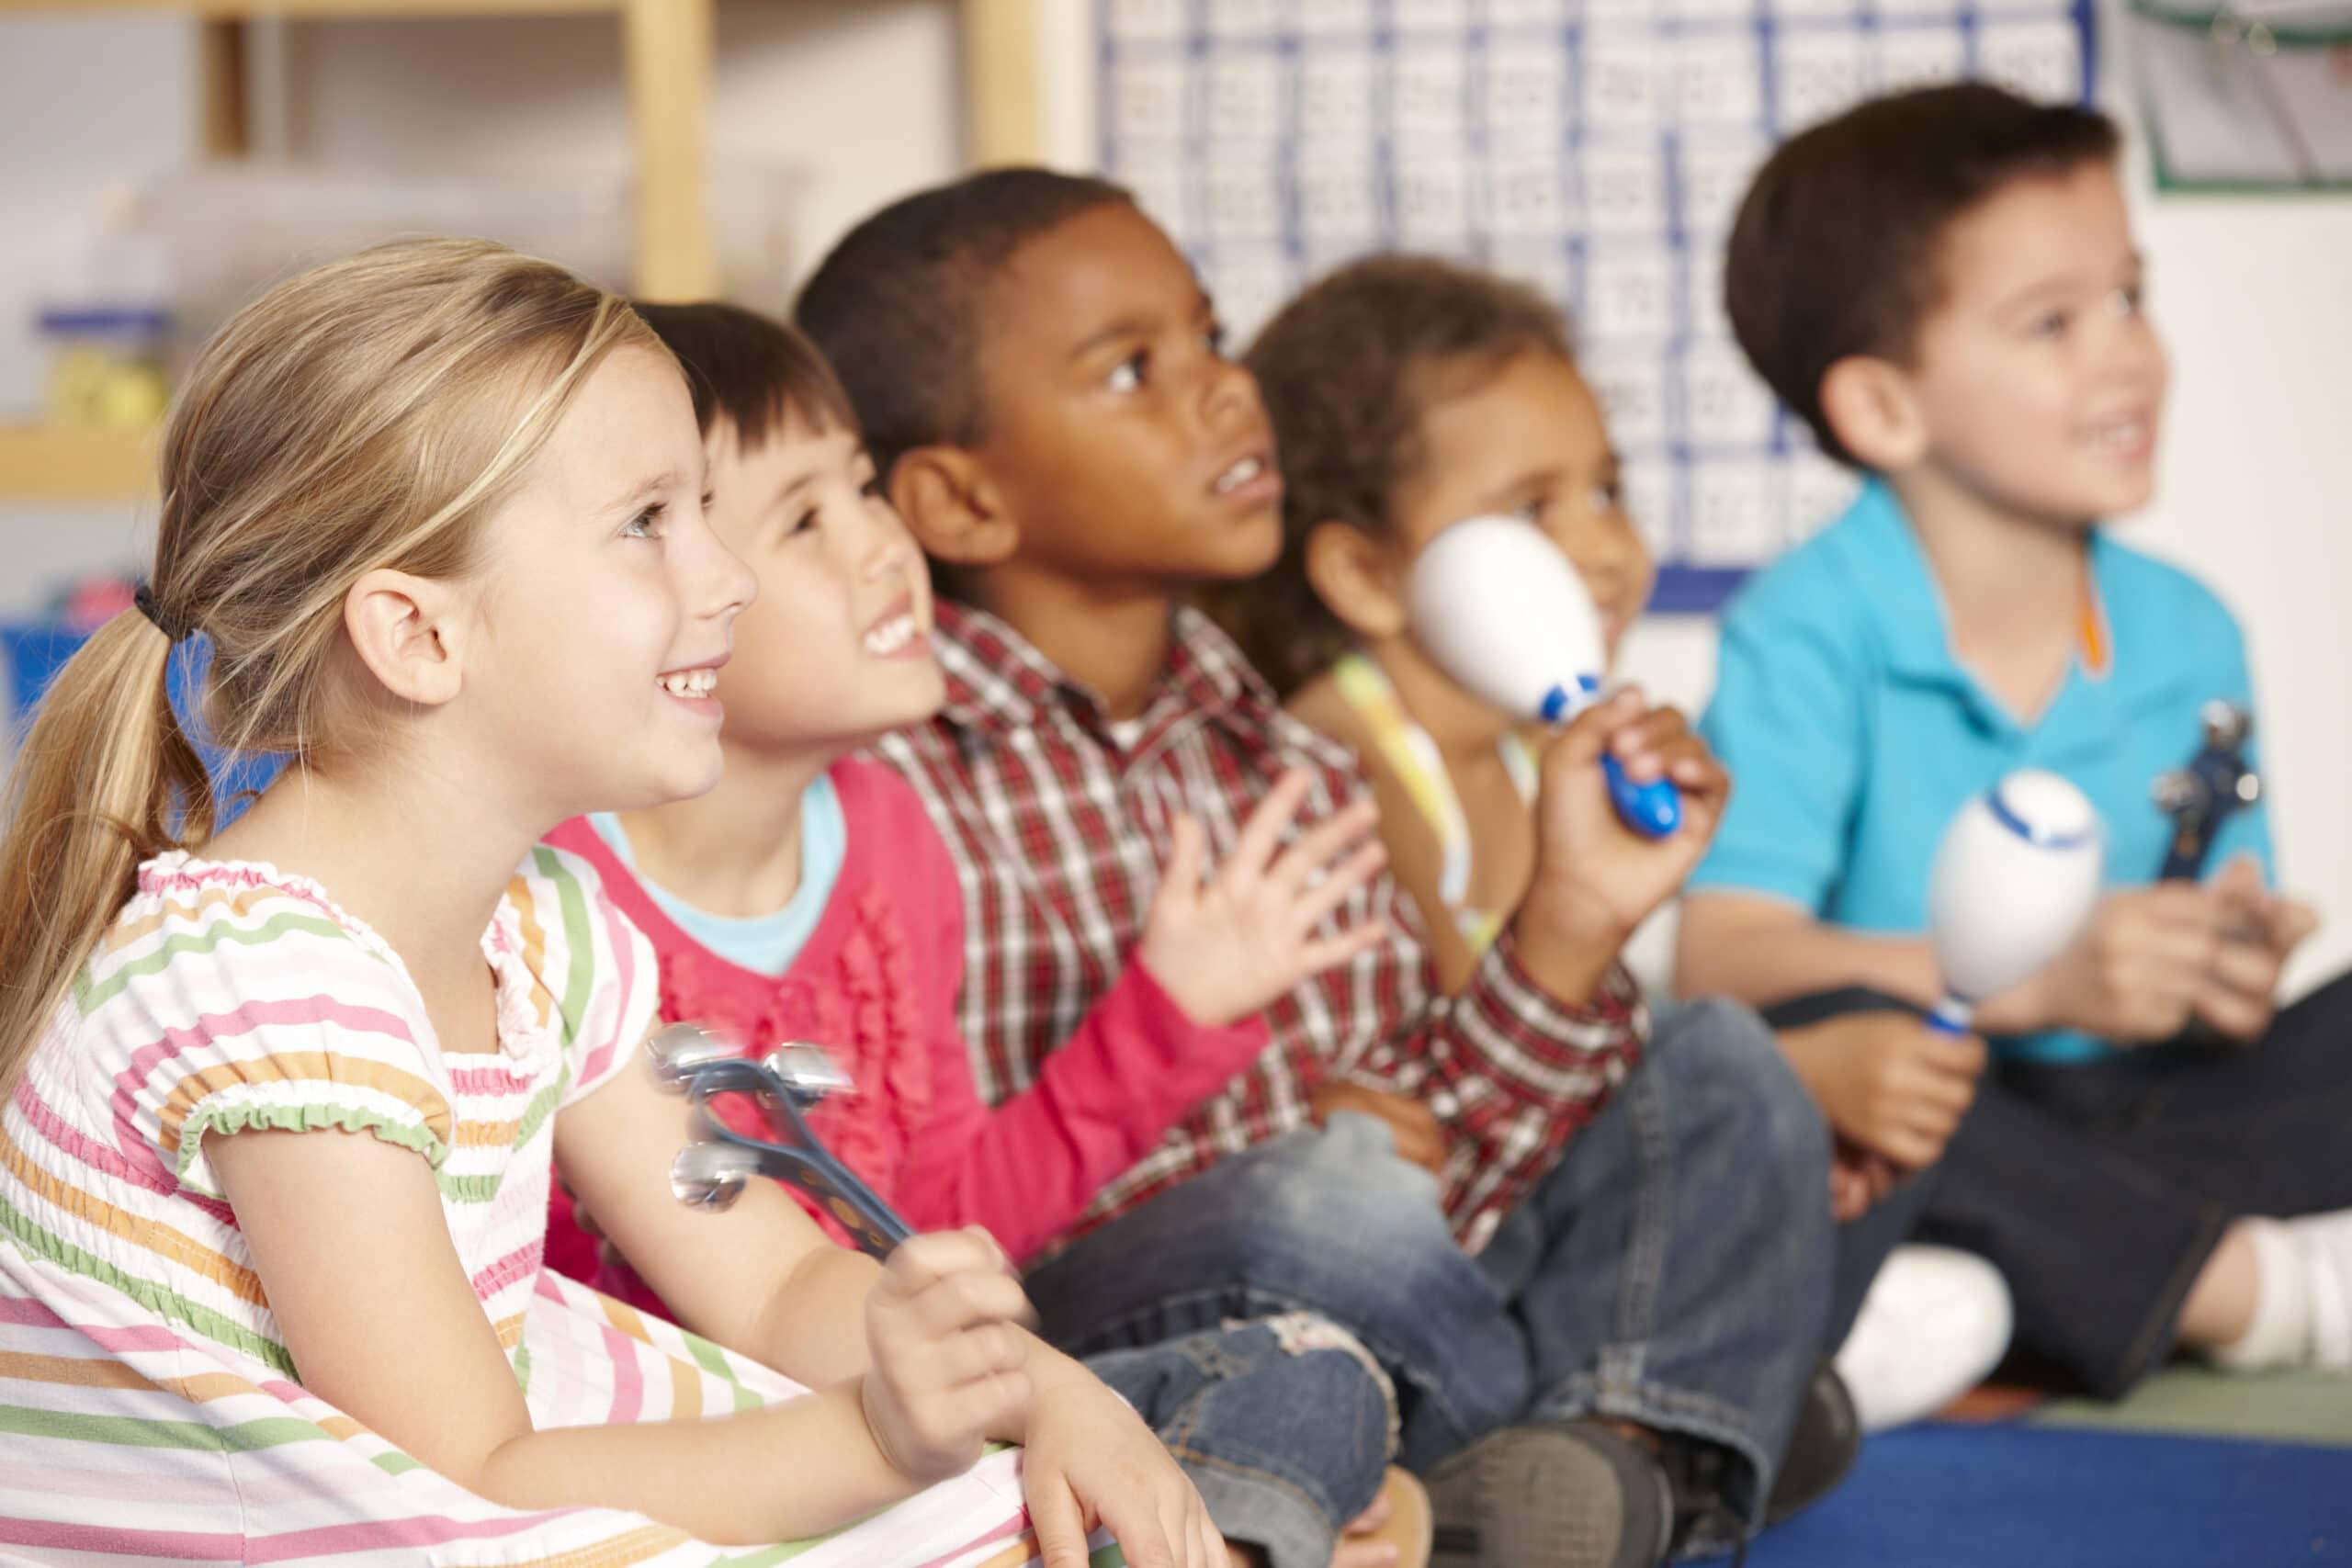 Group Of Elementary Age Schoolchildren In Music Class